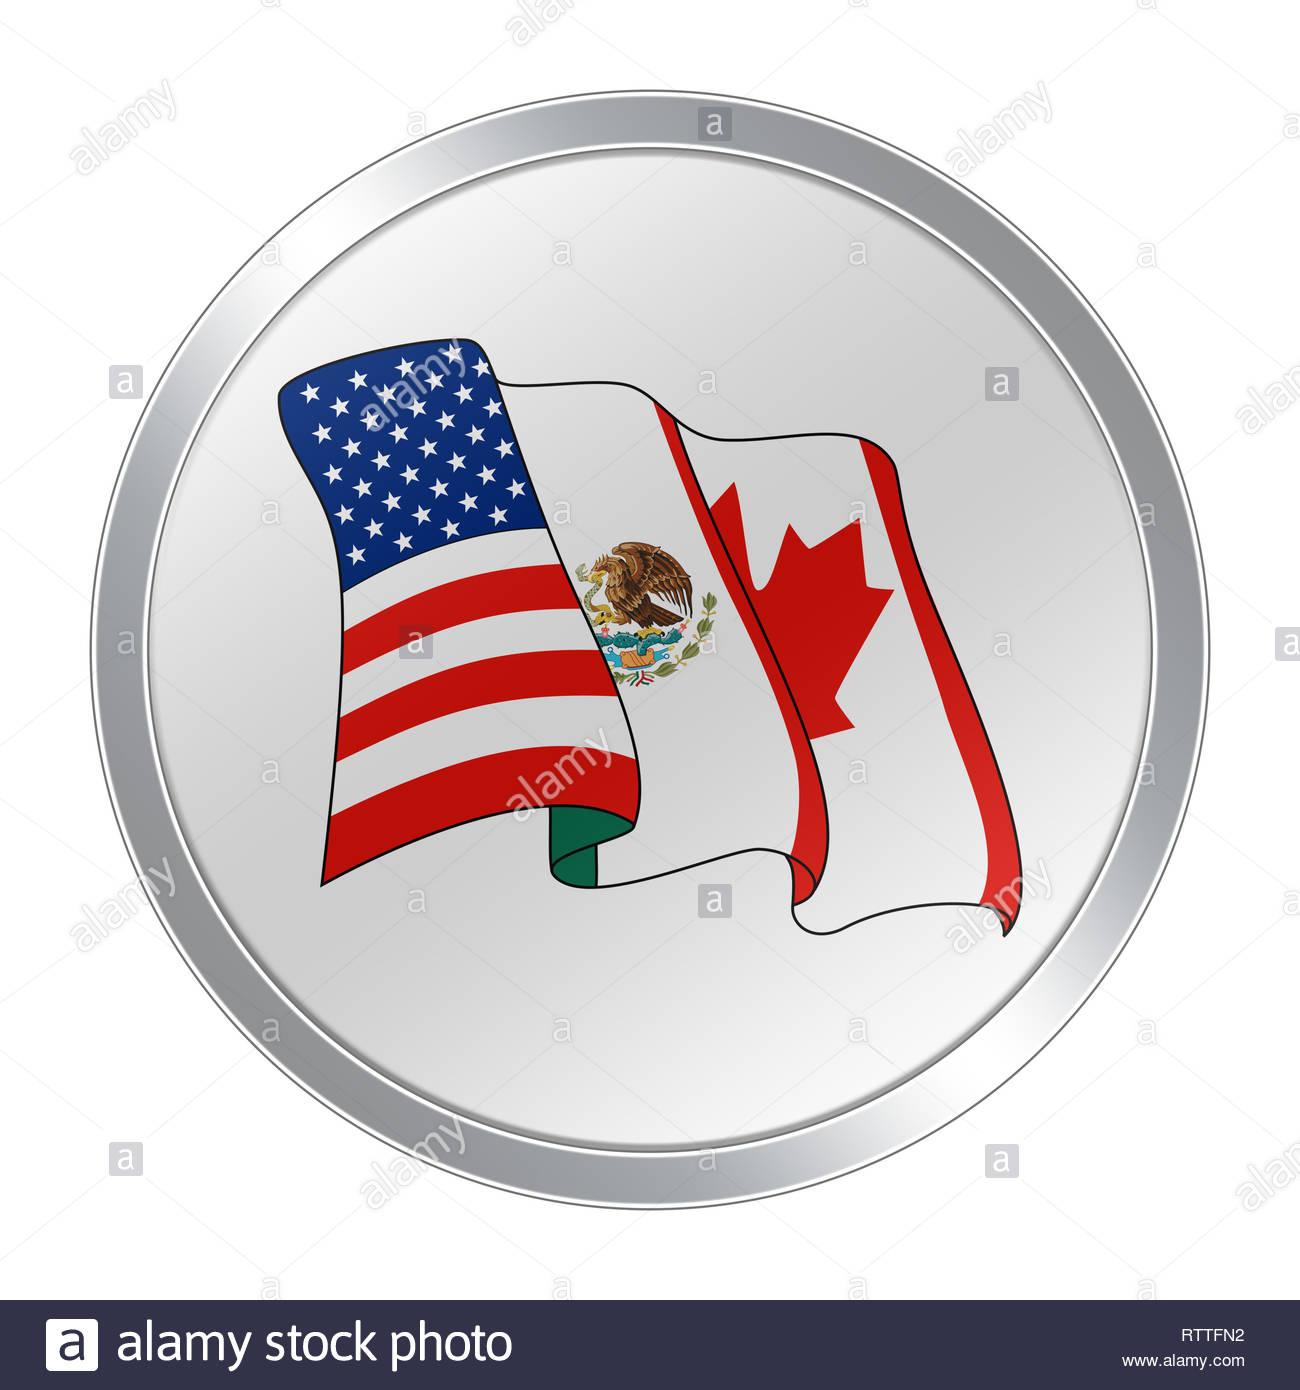 North American Free Trade Agreement NAFTA logo symbol Stock Photo